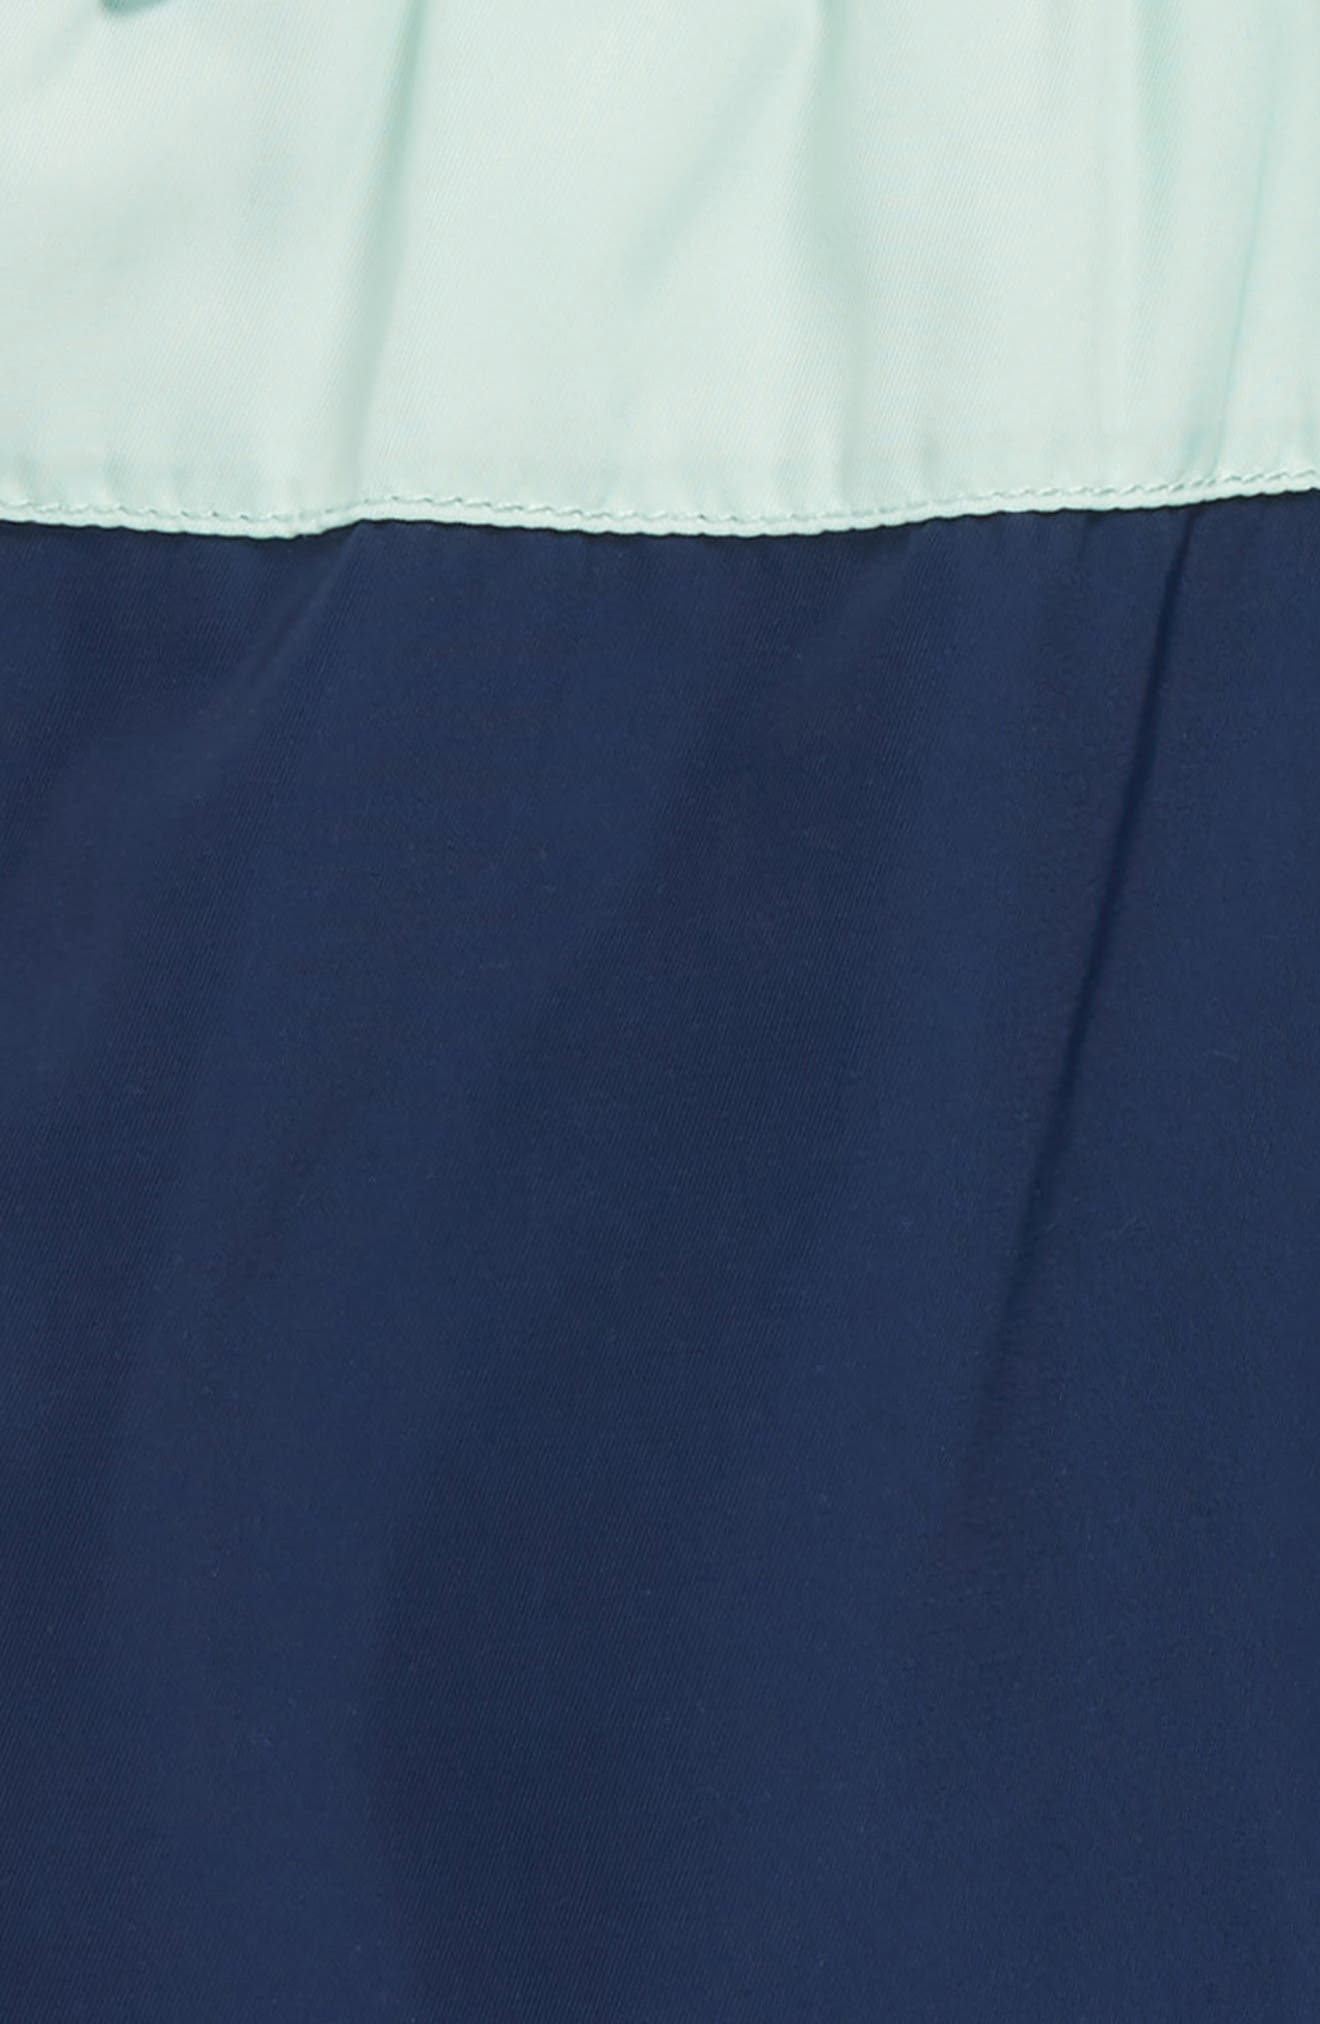 Alternate Image 2  - Scotch Shrunk Colorblock Swim Trunks (Little Boys & Big Boys)